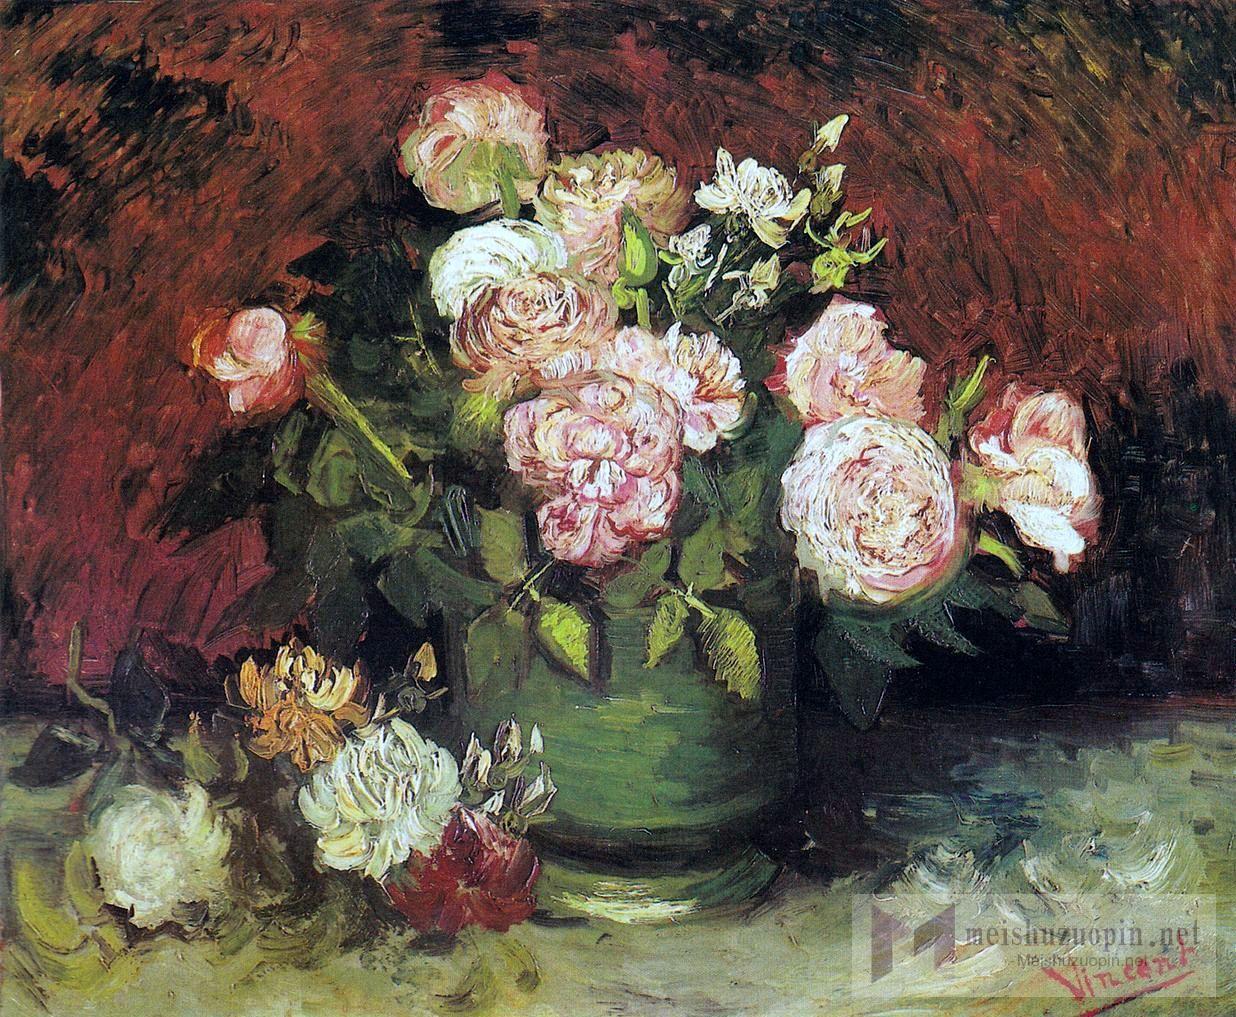 油画静物_盆中的牡丹和玫瑰_Bowl with Peonies and Roses-文森特·梵高